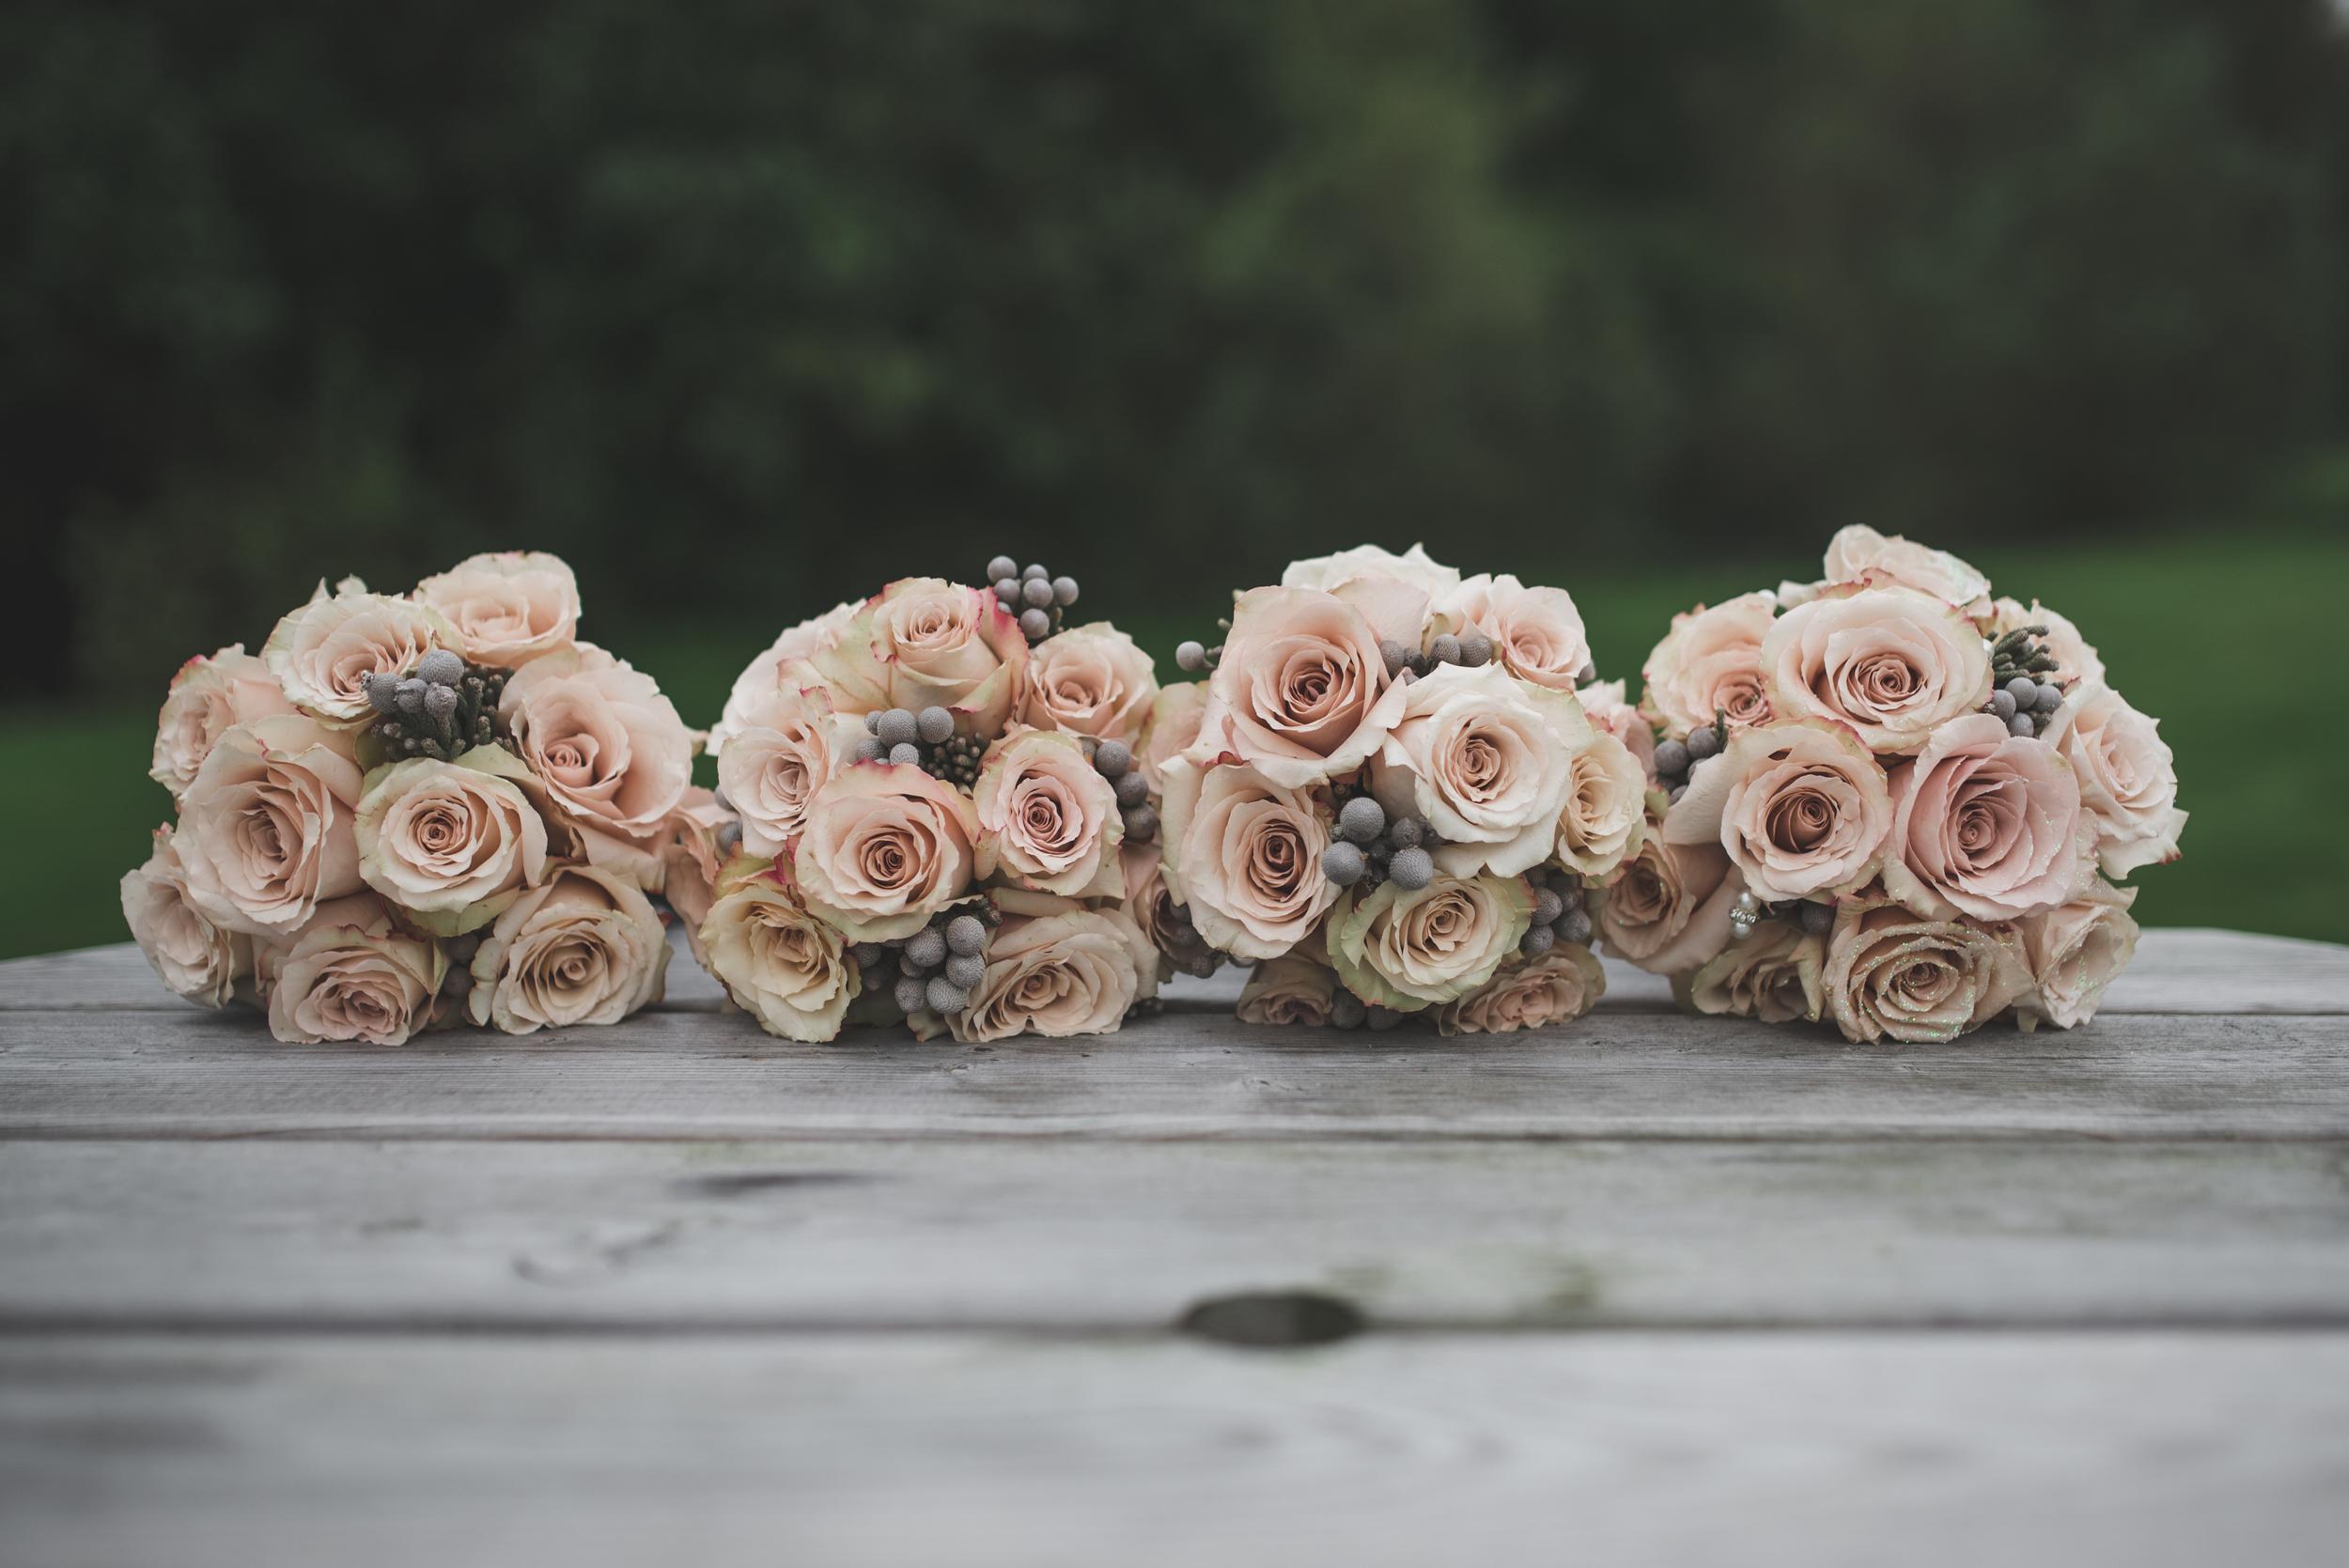 Northern_Ireland_Wedding_Photographer_Purephotoni_Dunsilly_Hotel_Wedding_Flowers_Bouquet